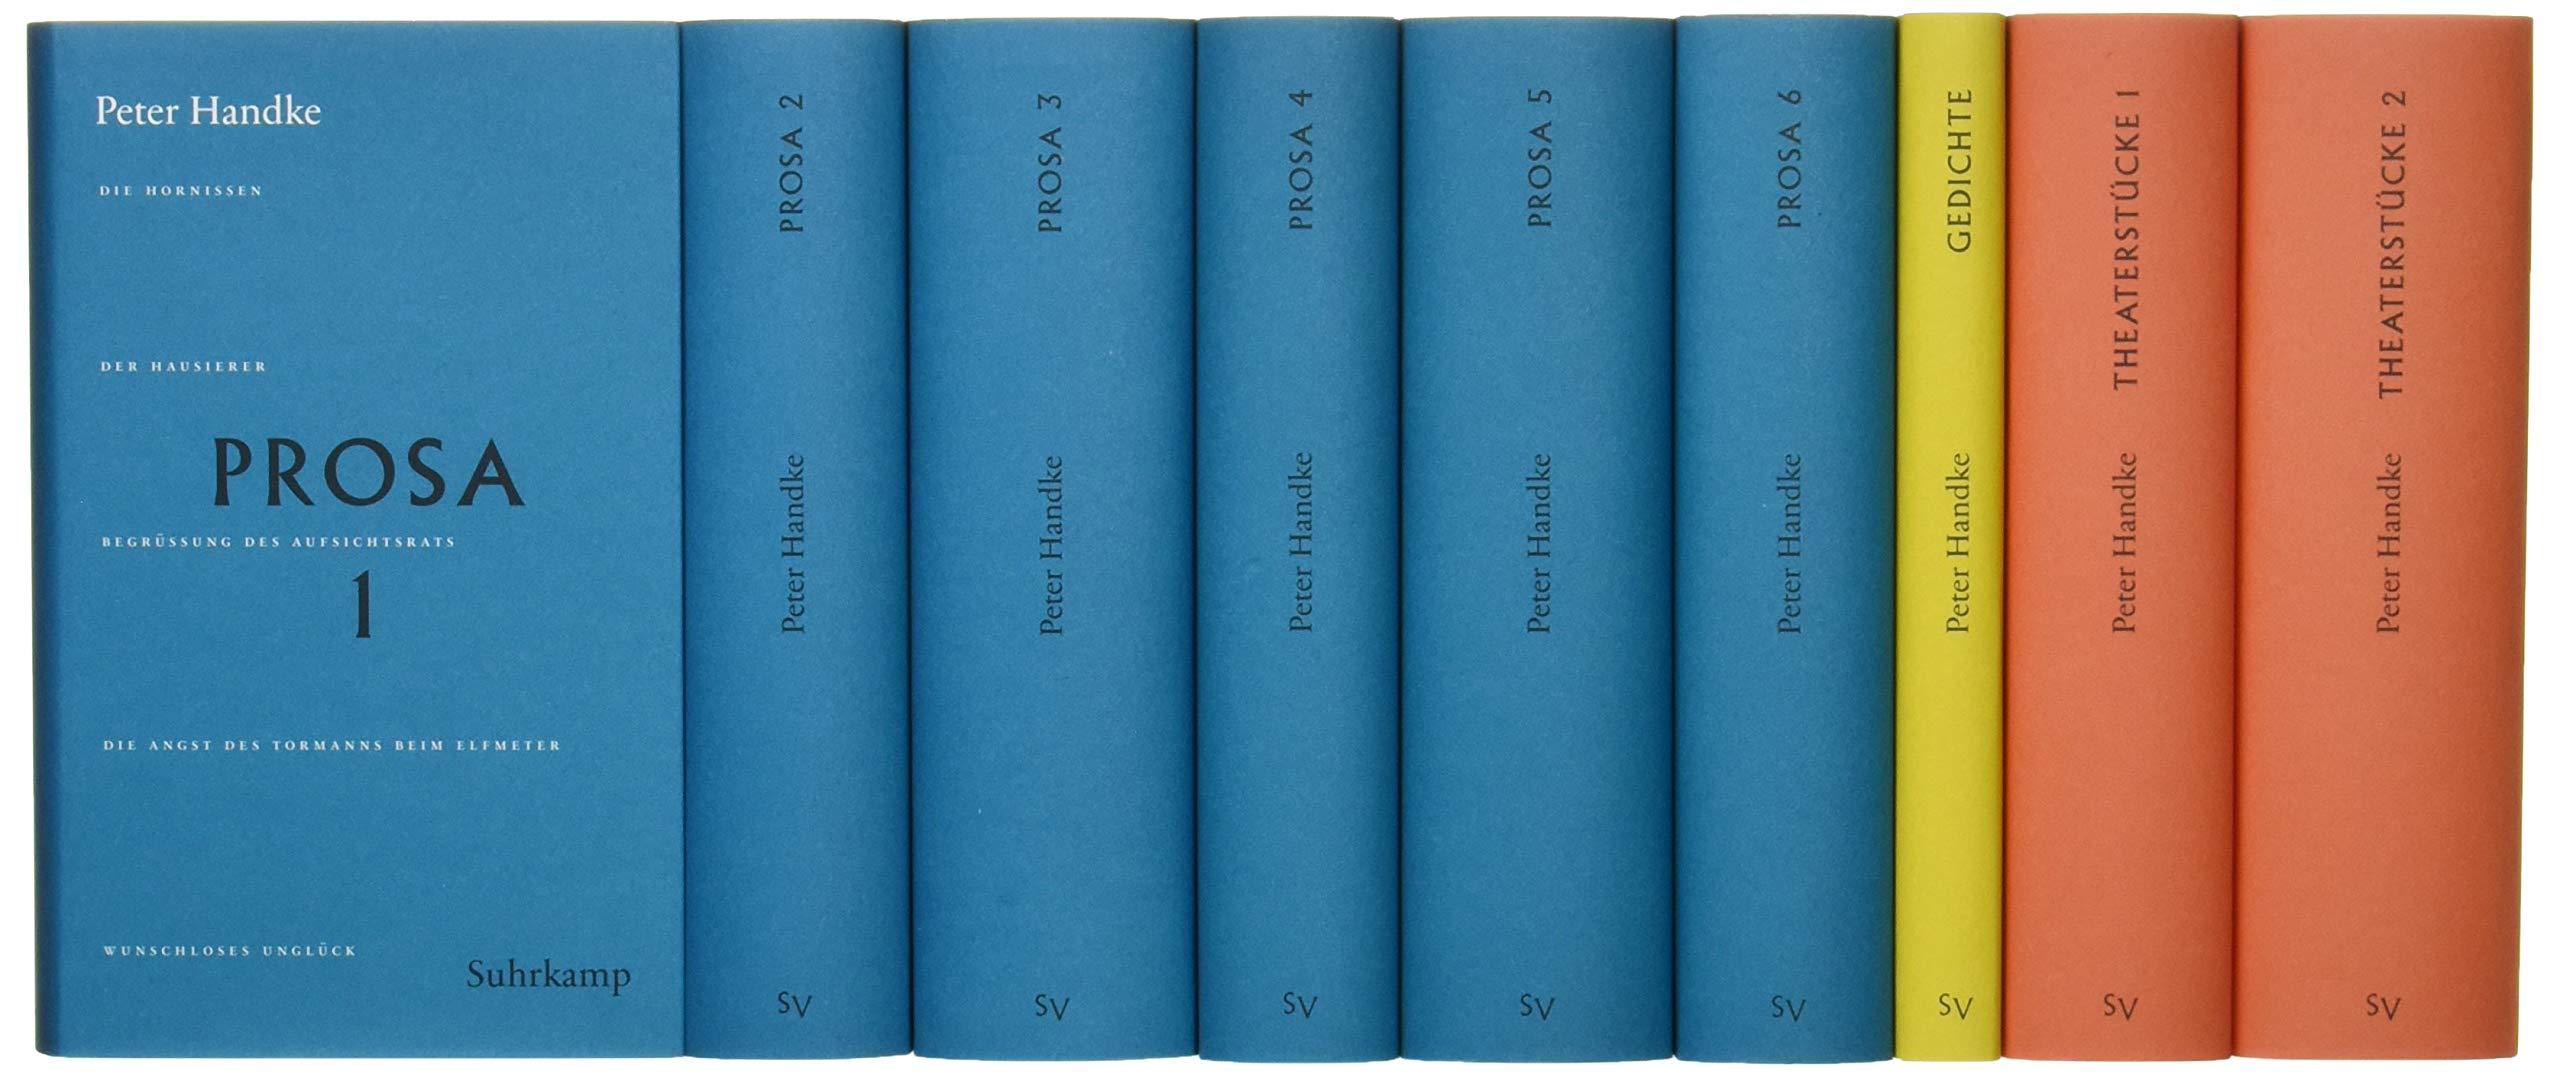 Handke Bibliothek I: Bnde 1-9: Prosa, Gedichte Theaterstcke: Amazon.es: Handke, Peter: Libros en idiomas extranjeros